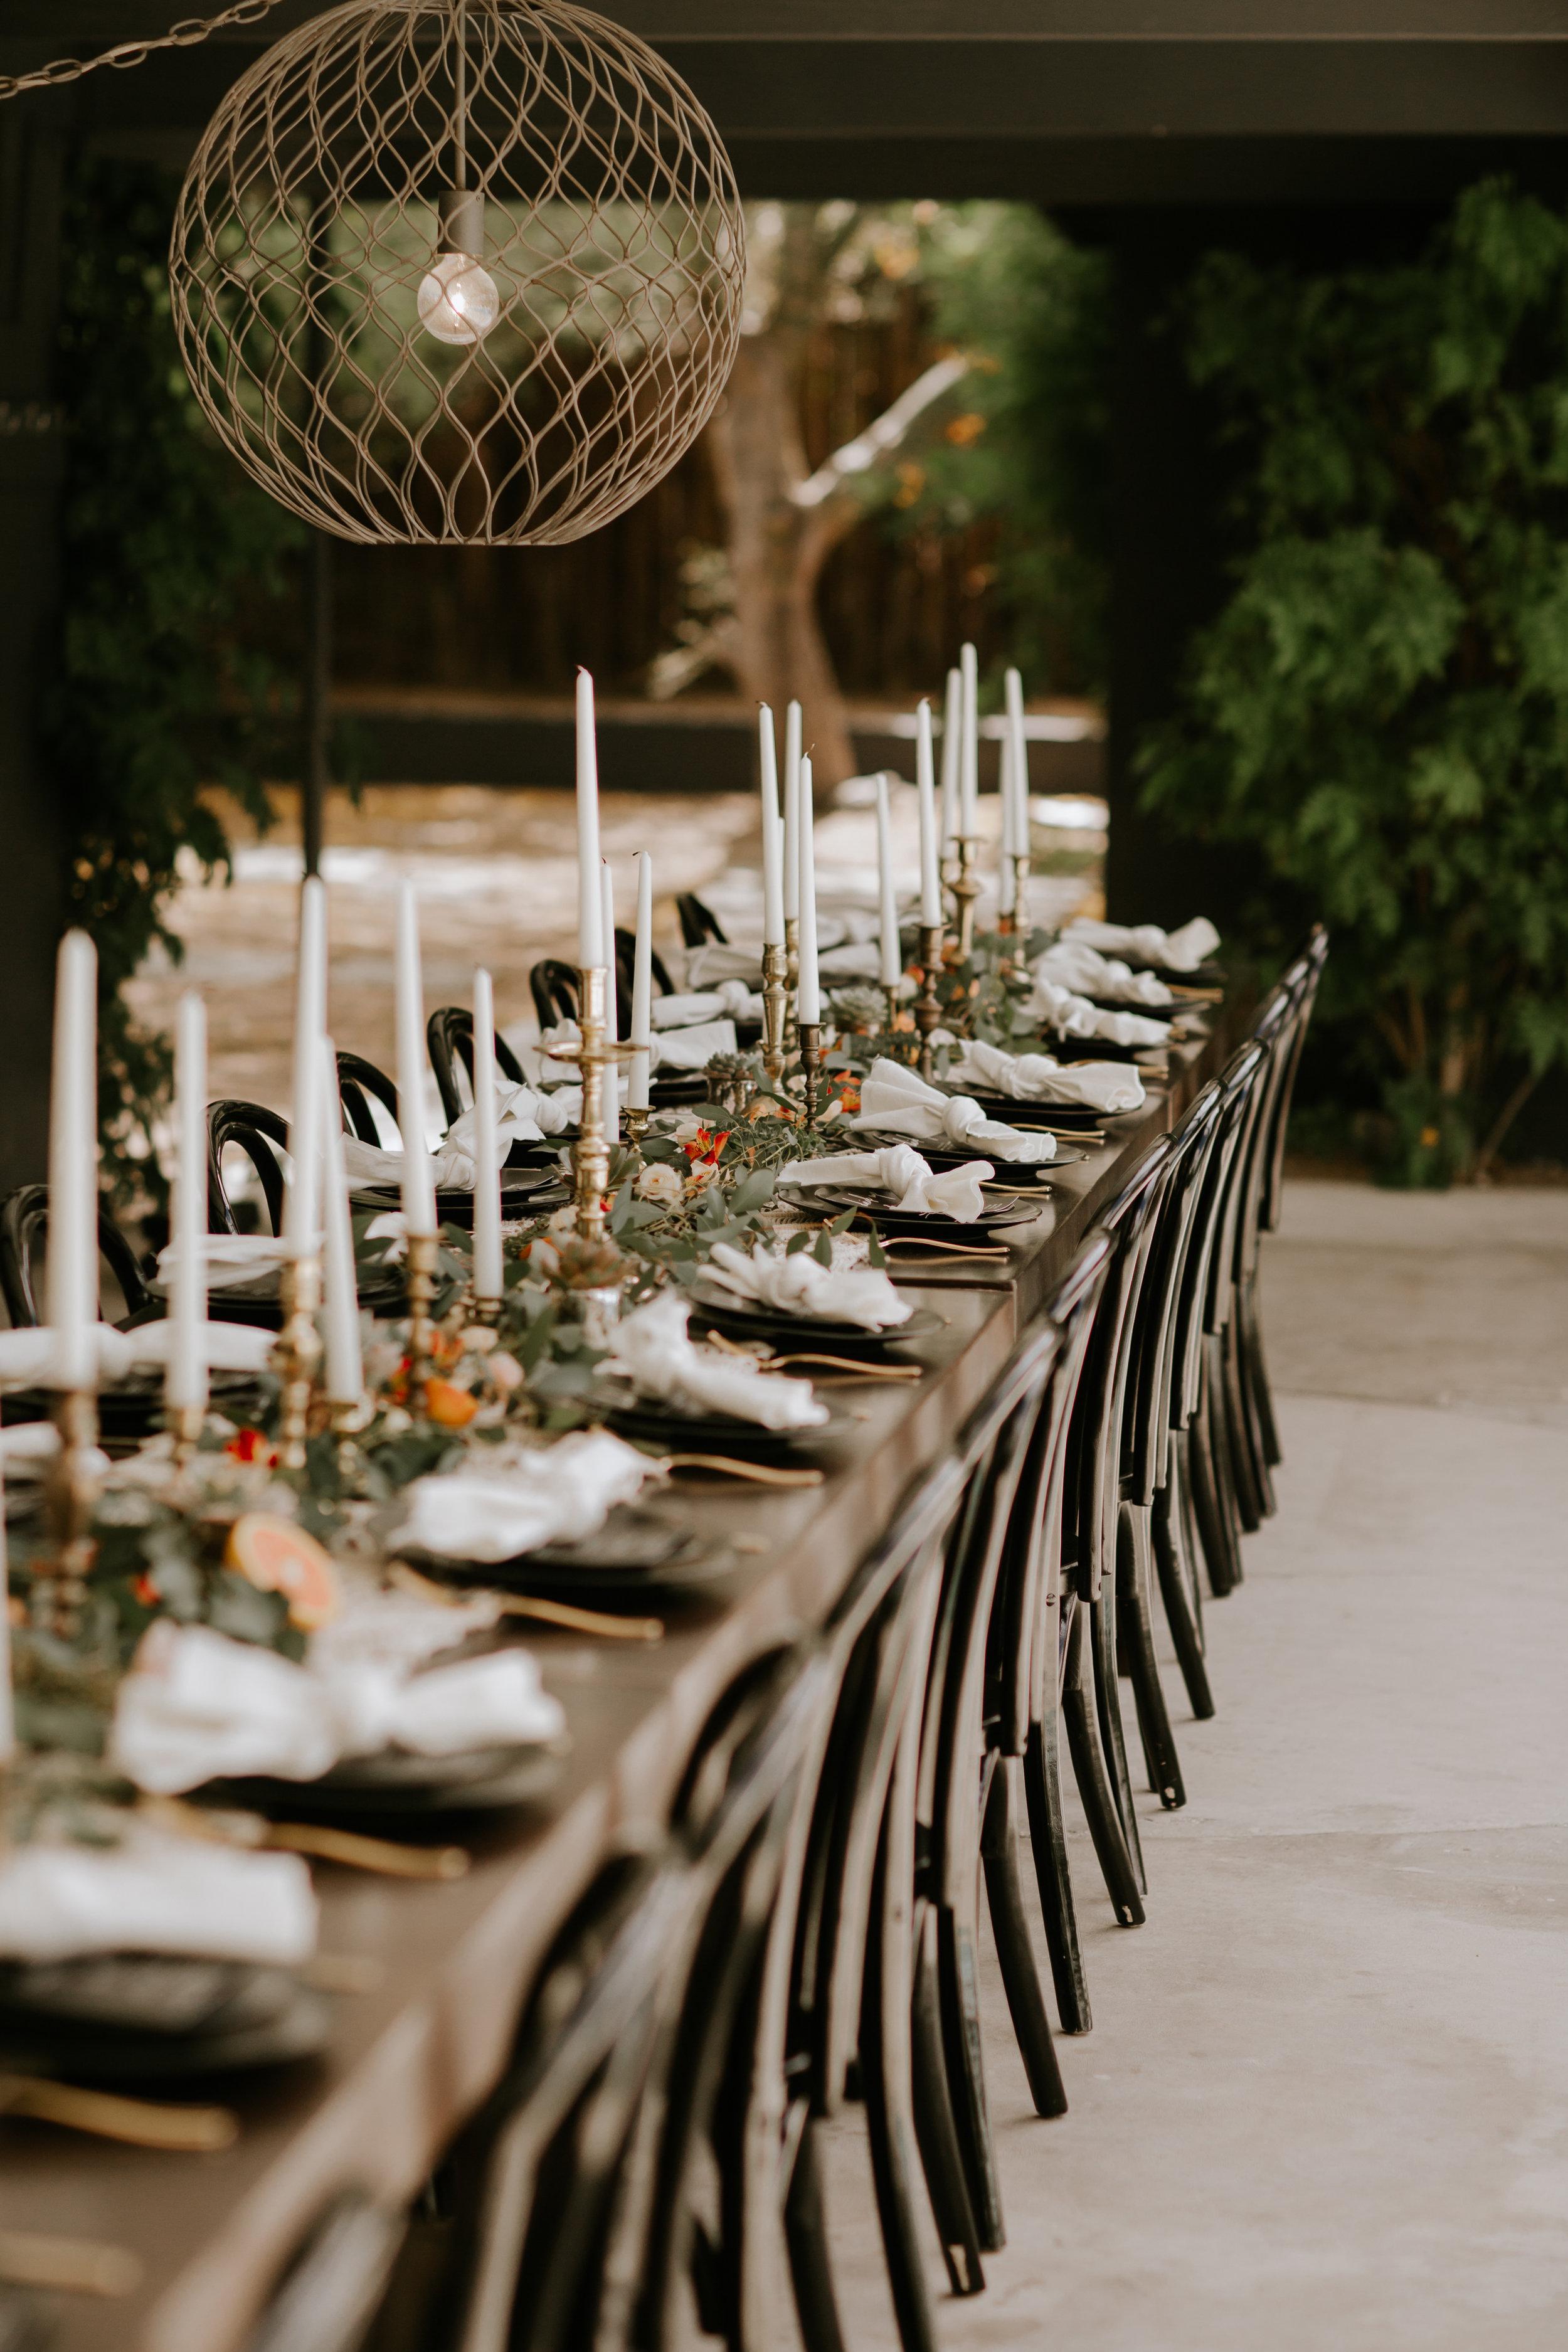 2019-05-26_Callie-Evan_Wedding_Joshua Tree_Paige Nelson_PREVIEWS HR-26.jpg